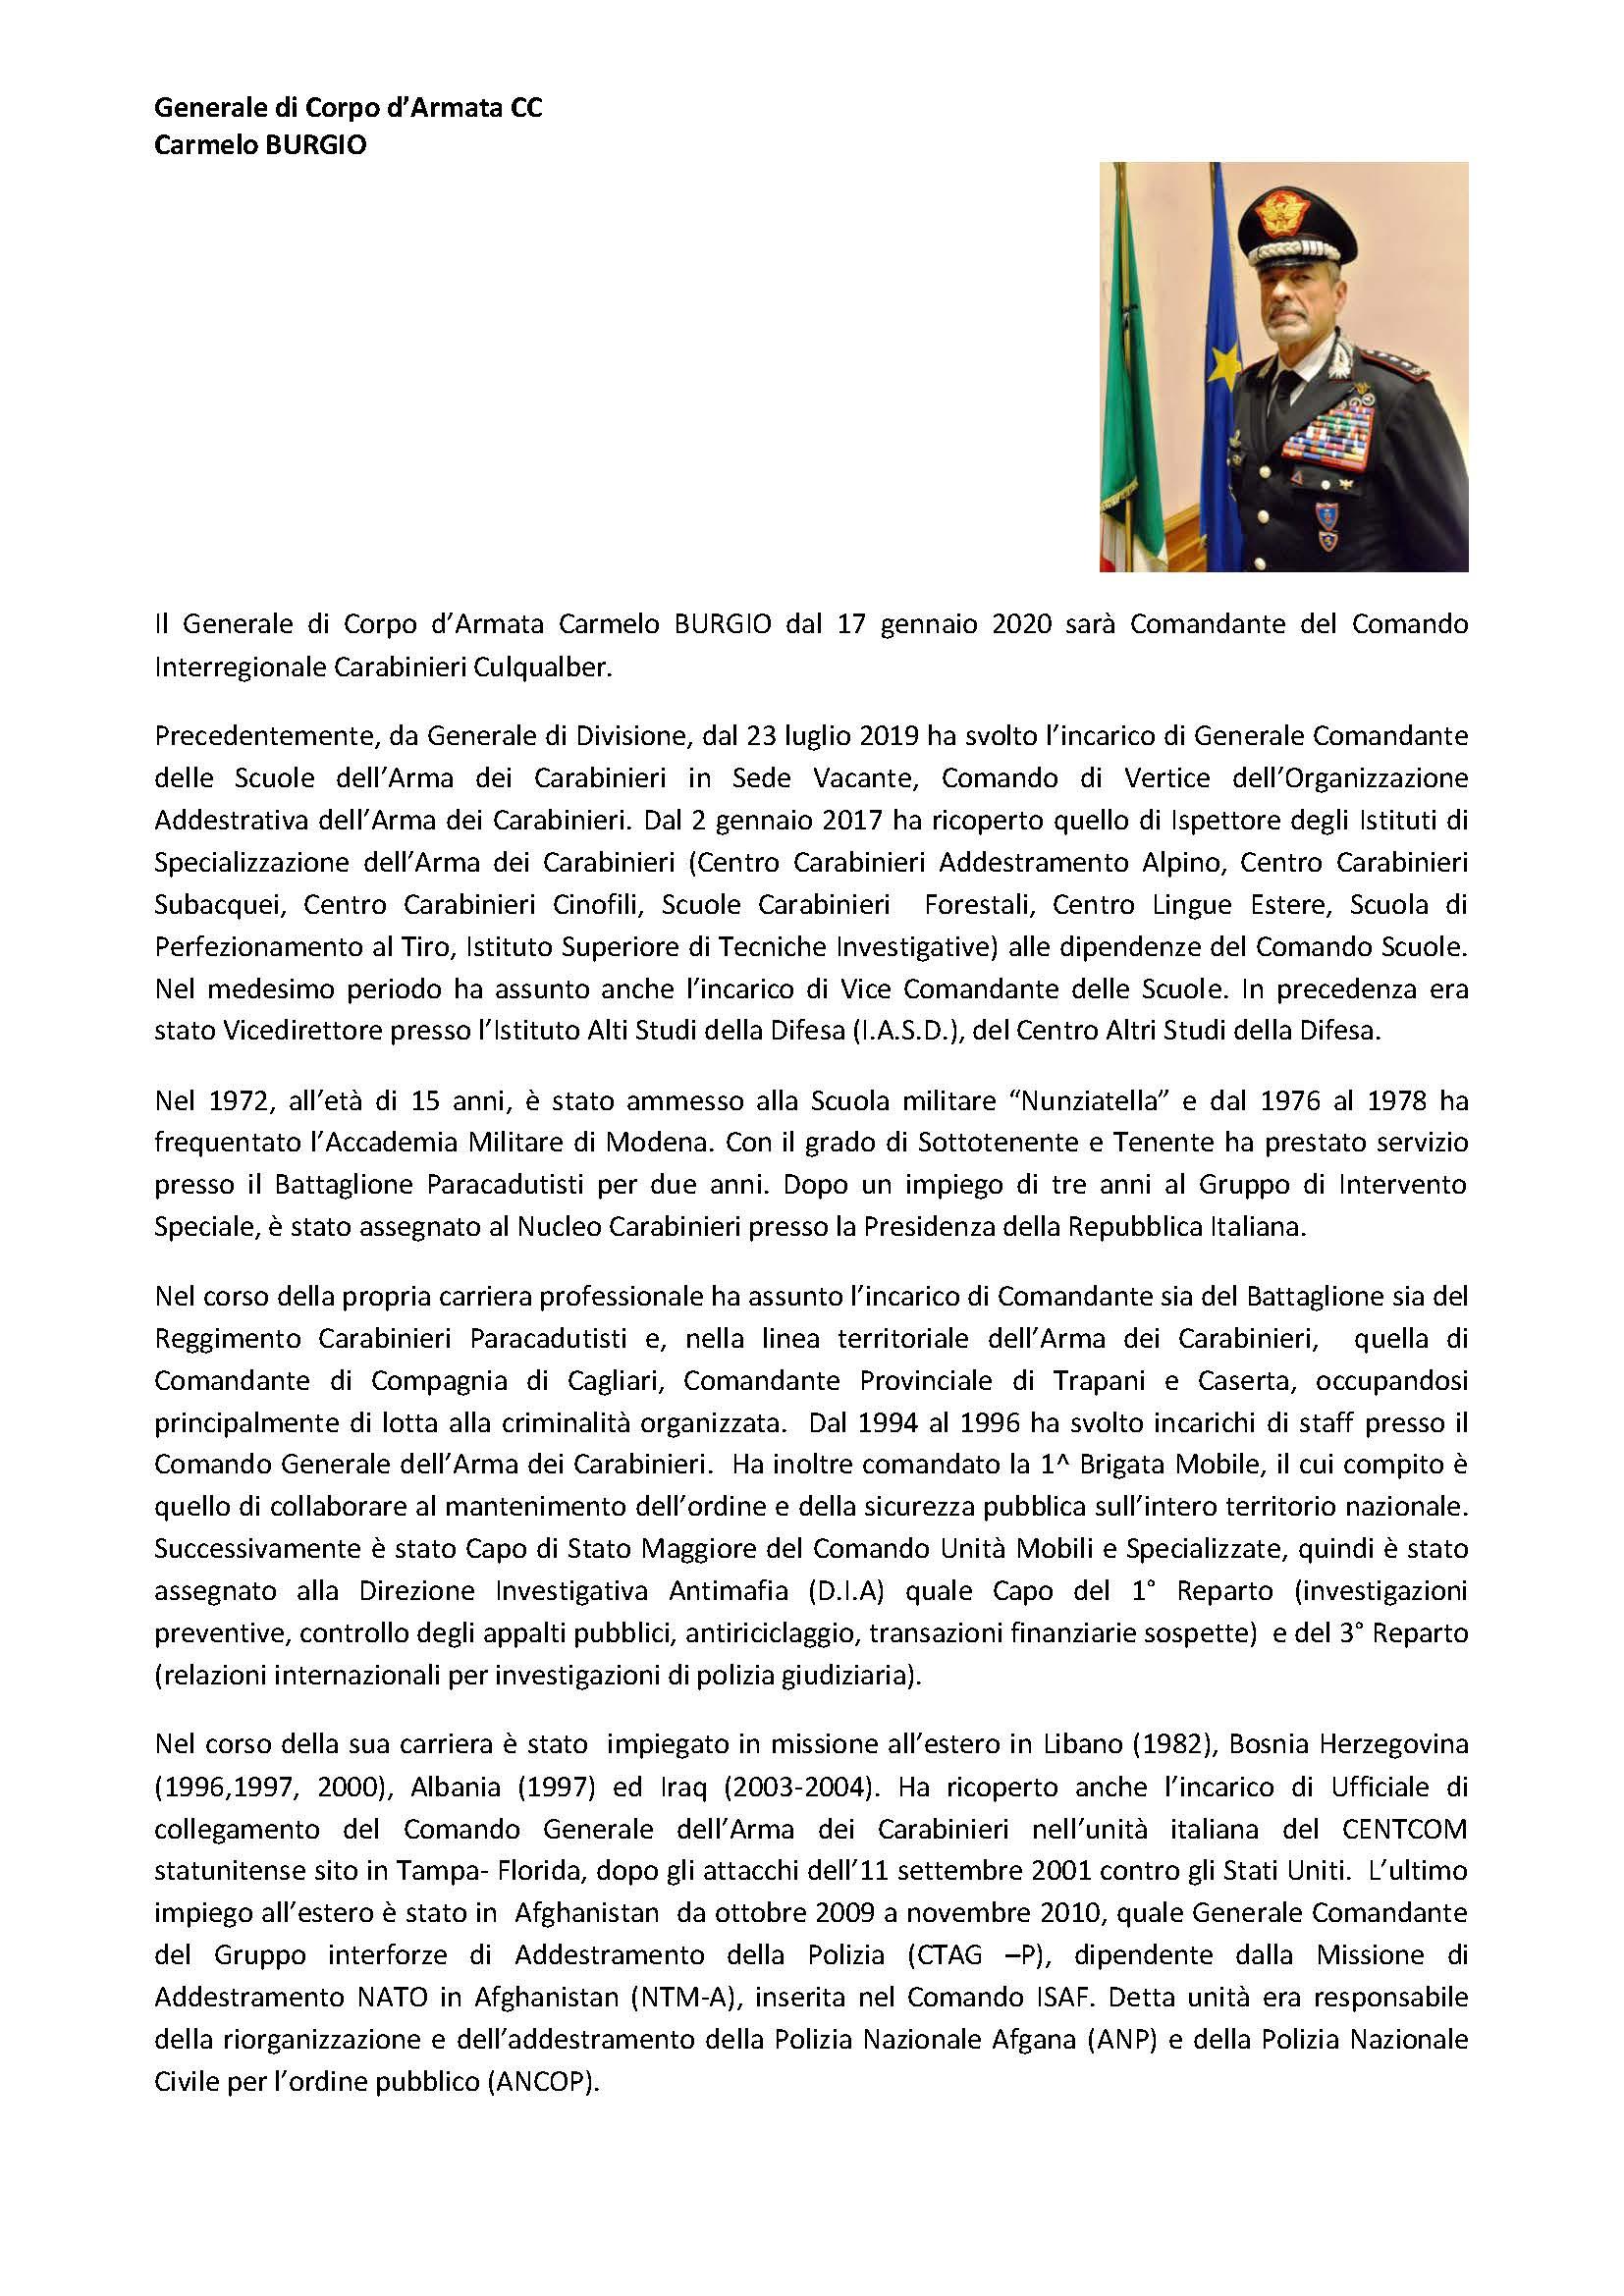 Curriculum Vitae Gen. C.A. Carmelo BURGIO (1)_Pagina_1